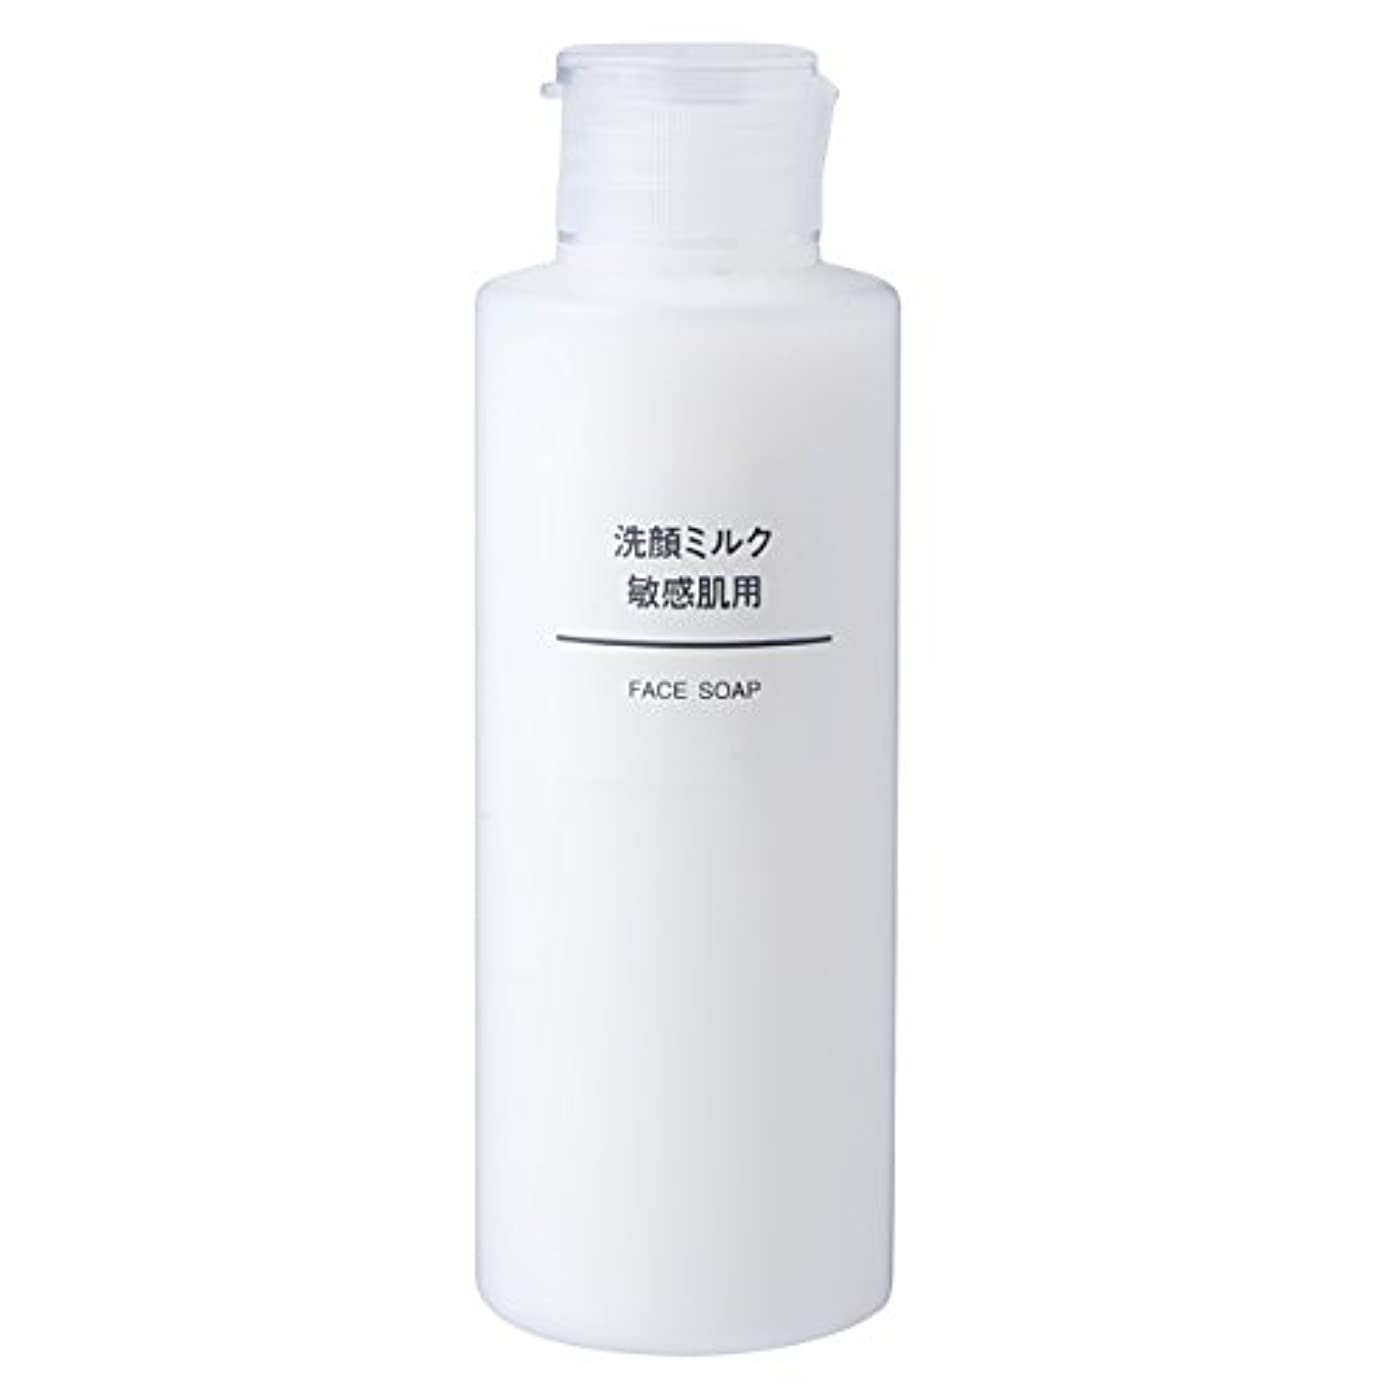 未接続歯科医閉塞無印良品 洗顔ミルク 敏感肌用 150ml